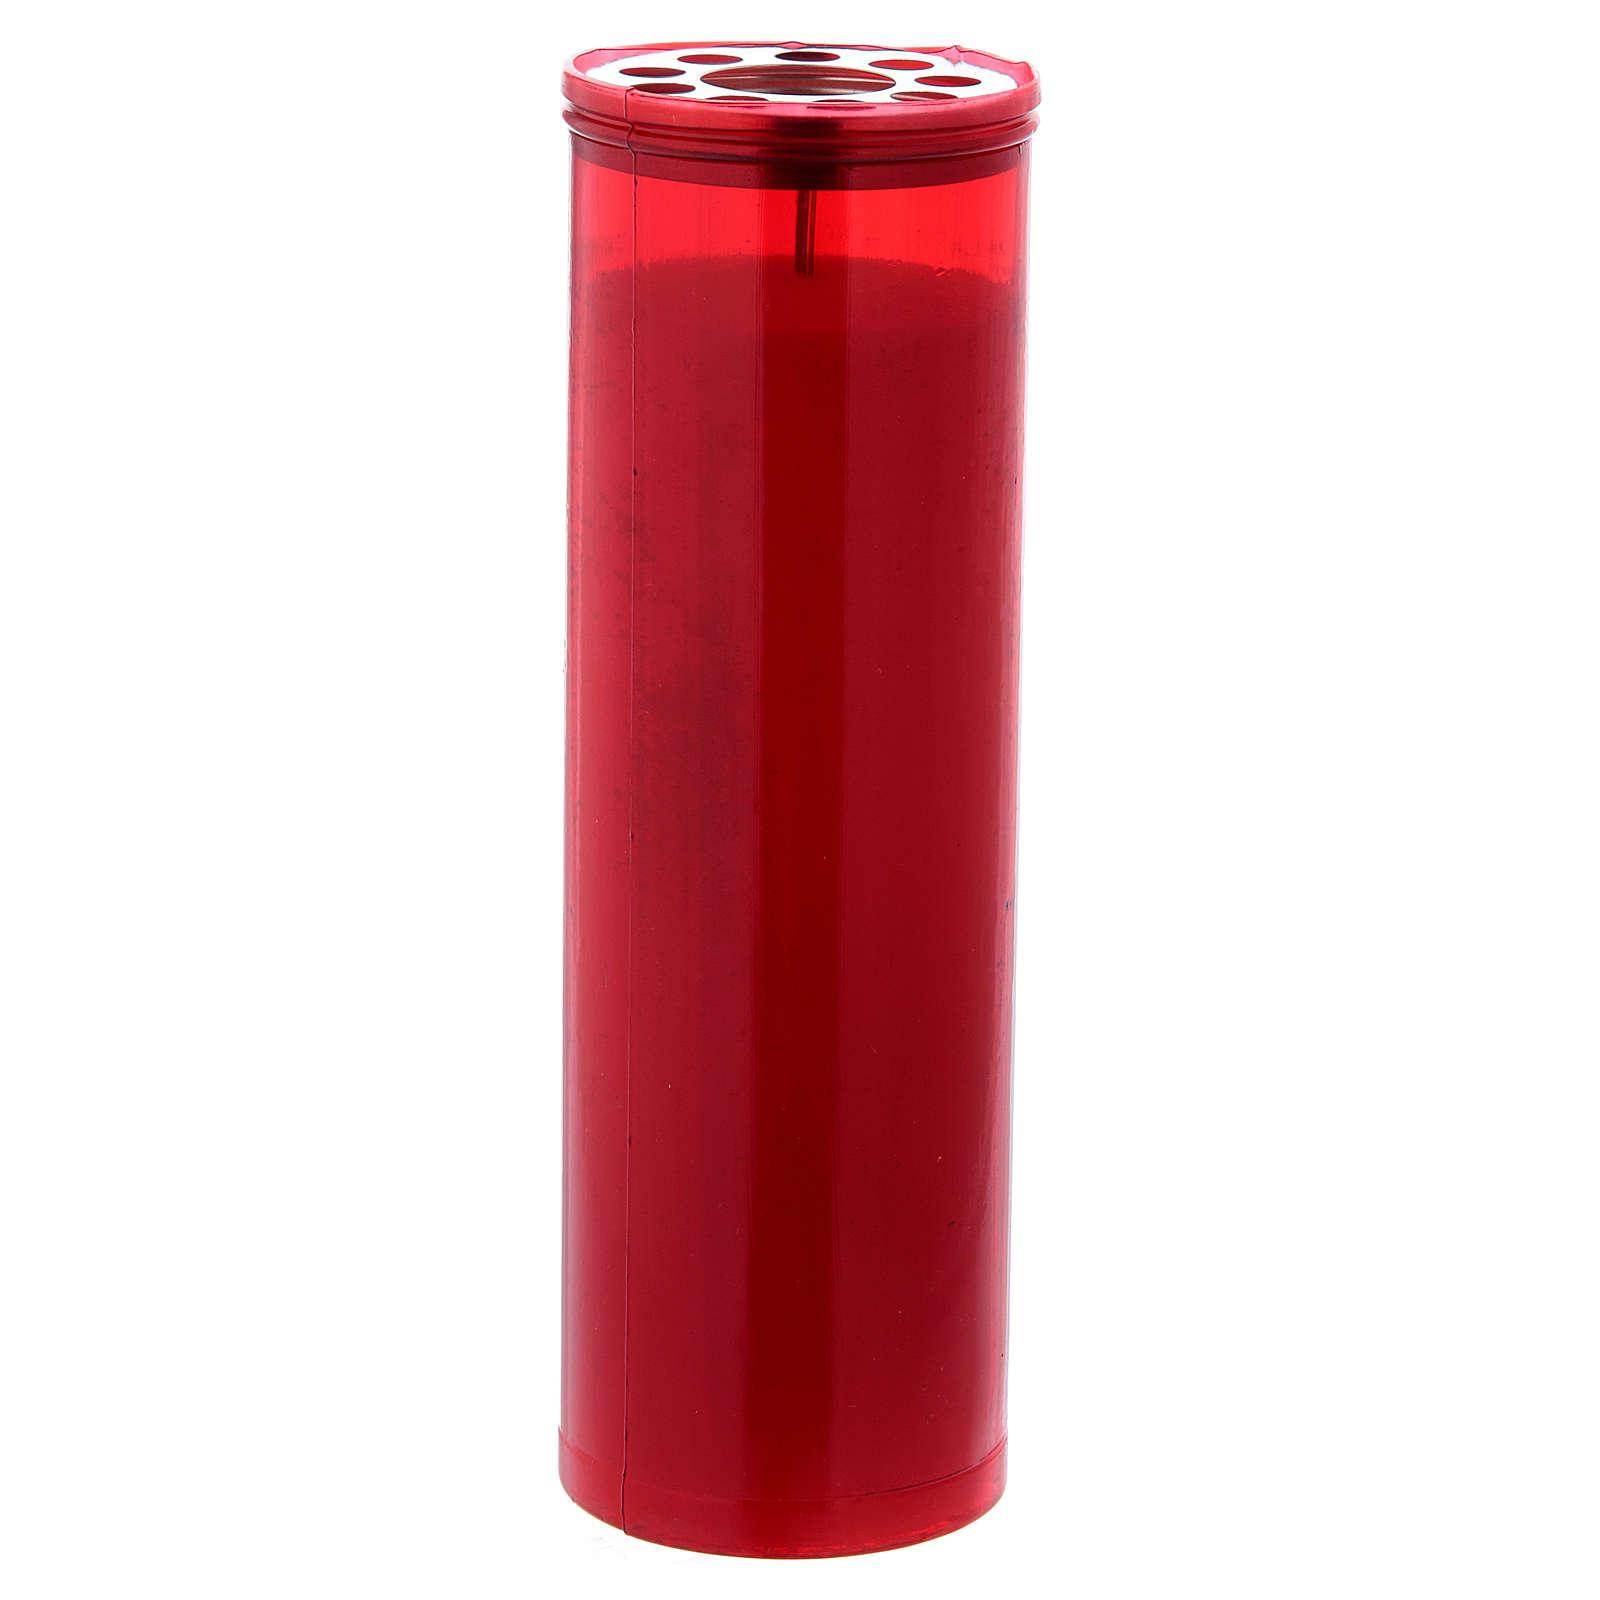 Vela votiva cor vermelha T60 cera branca 3